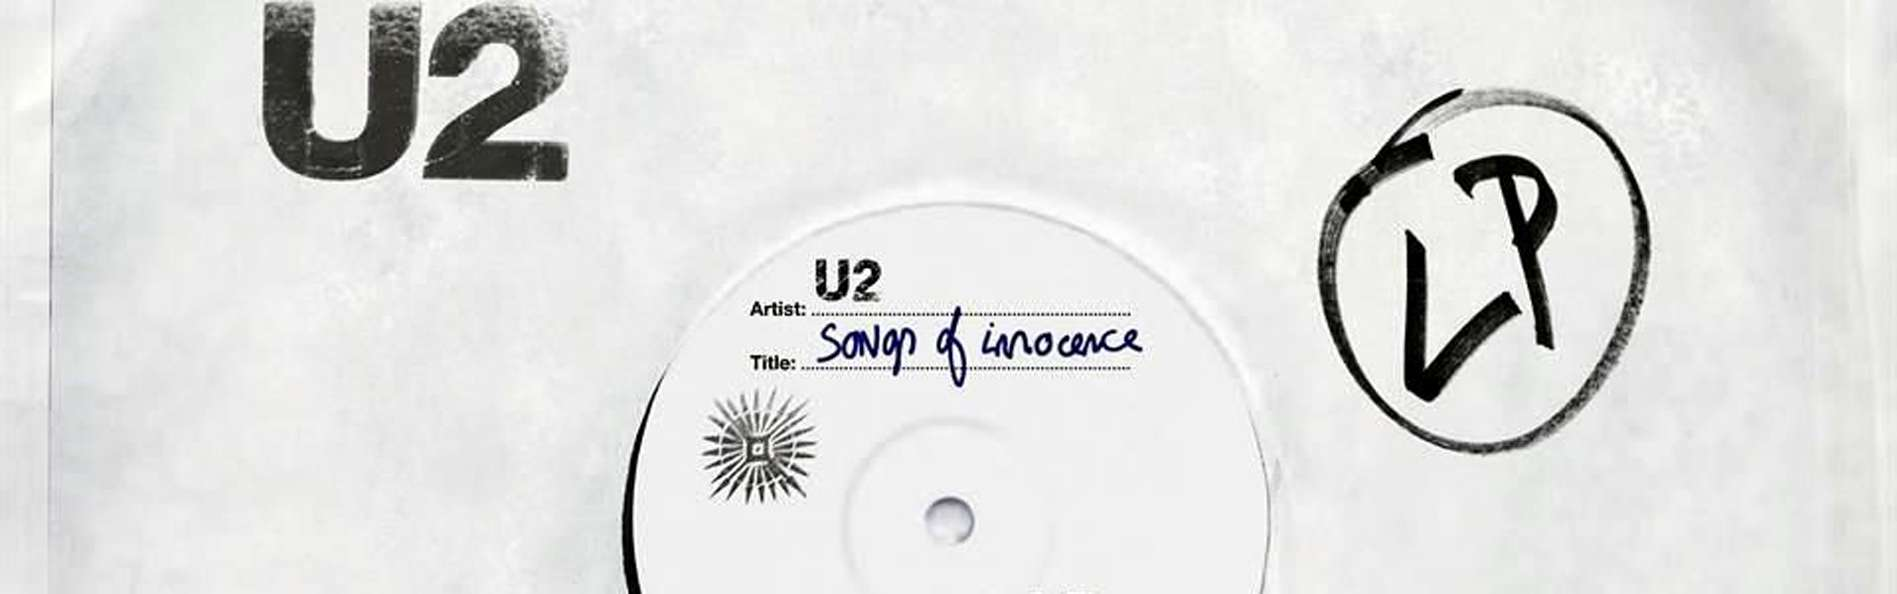 'Songs of Inocence' de U2. Foto: AP en español